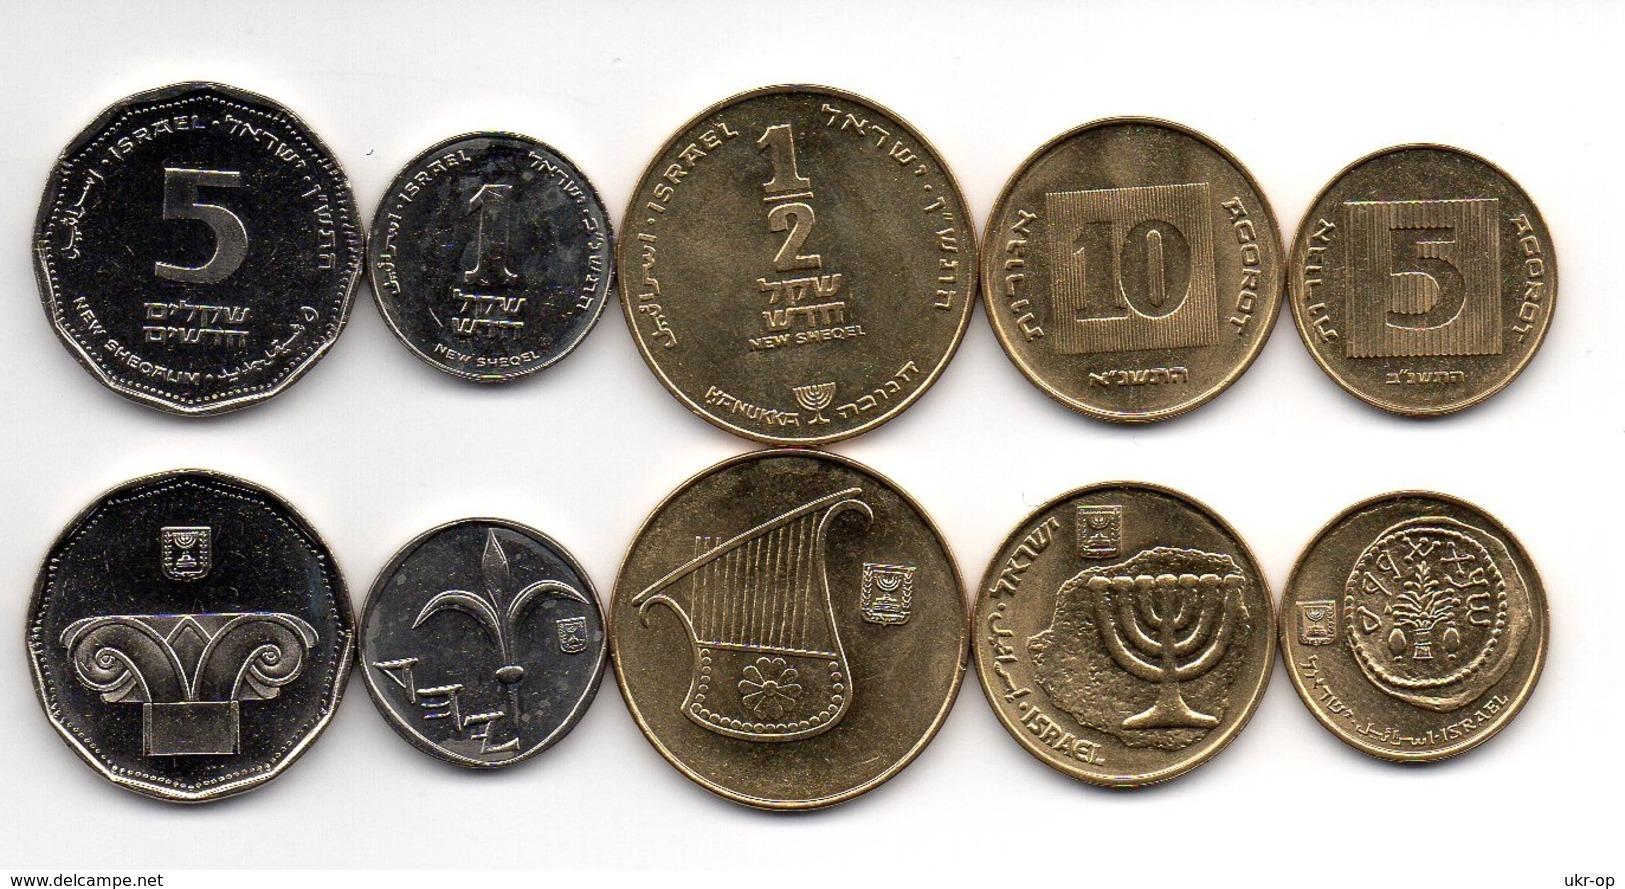 Israel - Set 5 Coins 5 10 1/2 Agorot 1 5 Sheqalim 1987 AUNC Ukr-OP - Israël